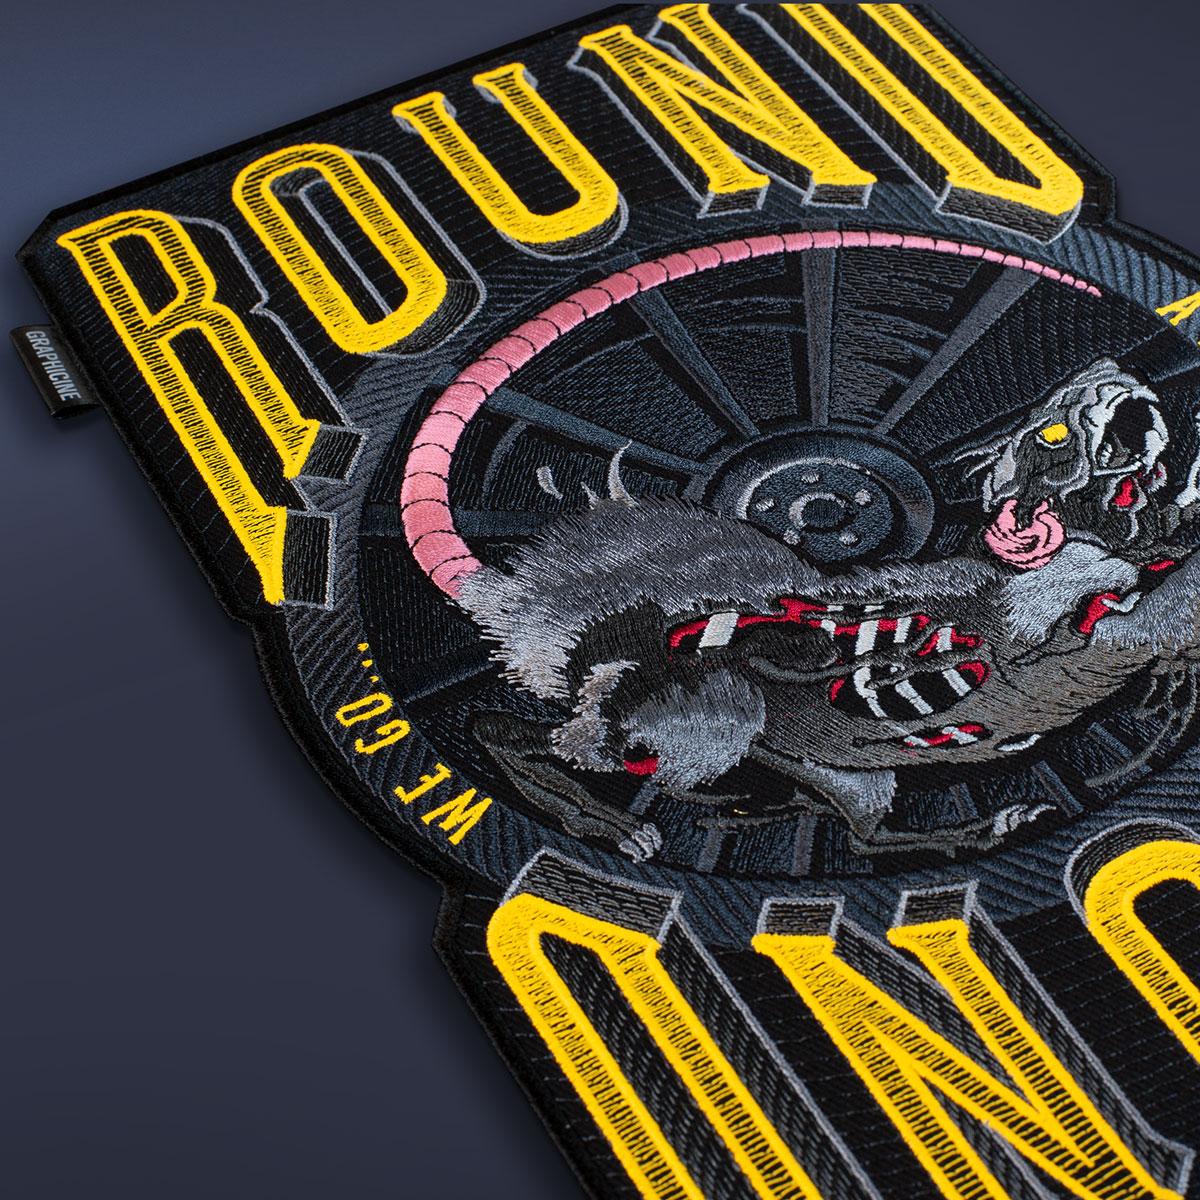 round_and_round_graphicine_3